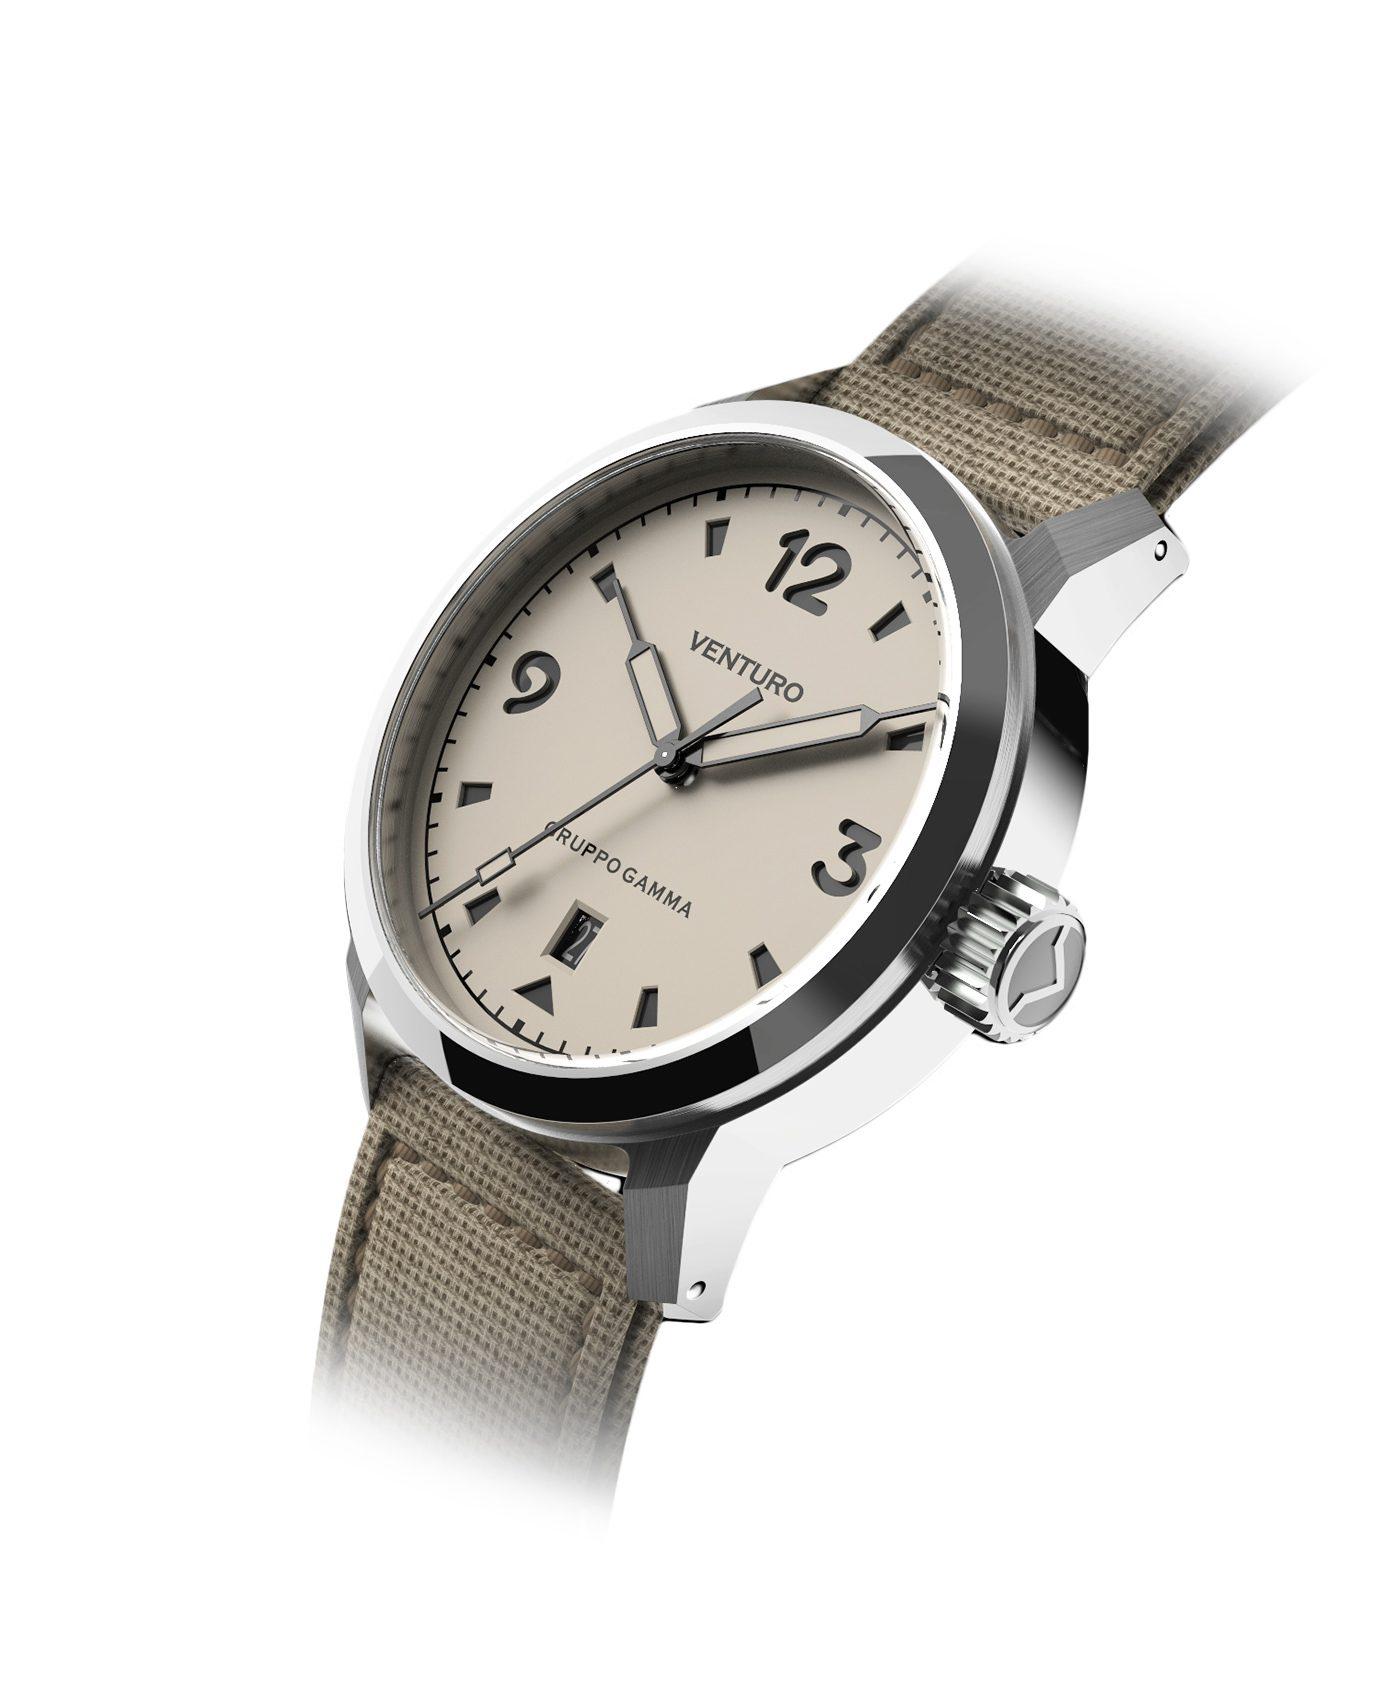 Venturo - Field Watch - Black Dial & BGW9 markers